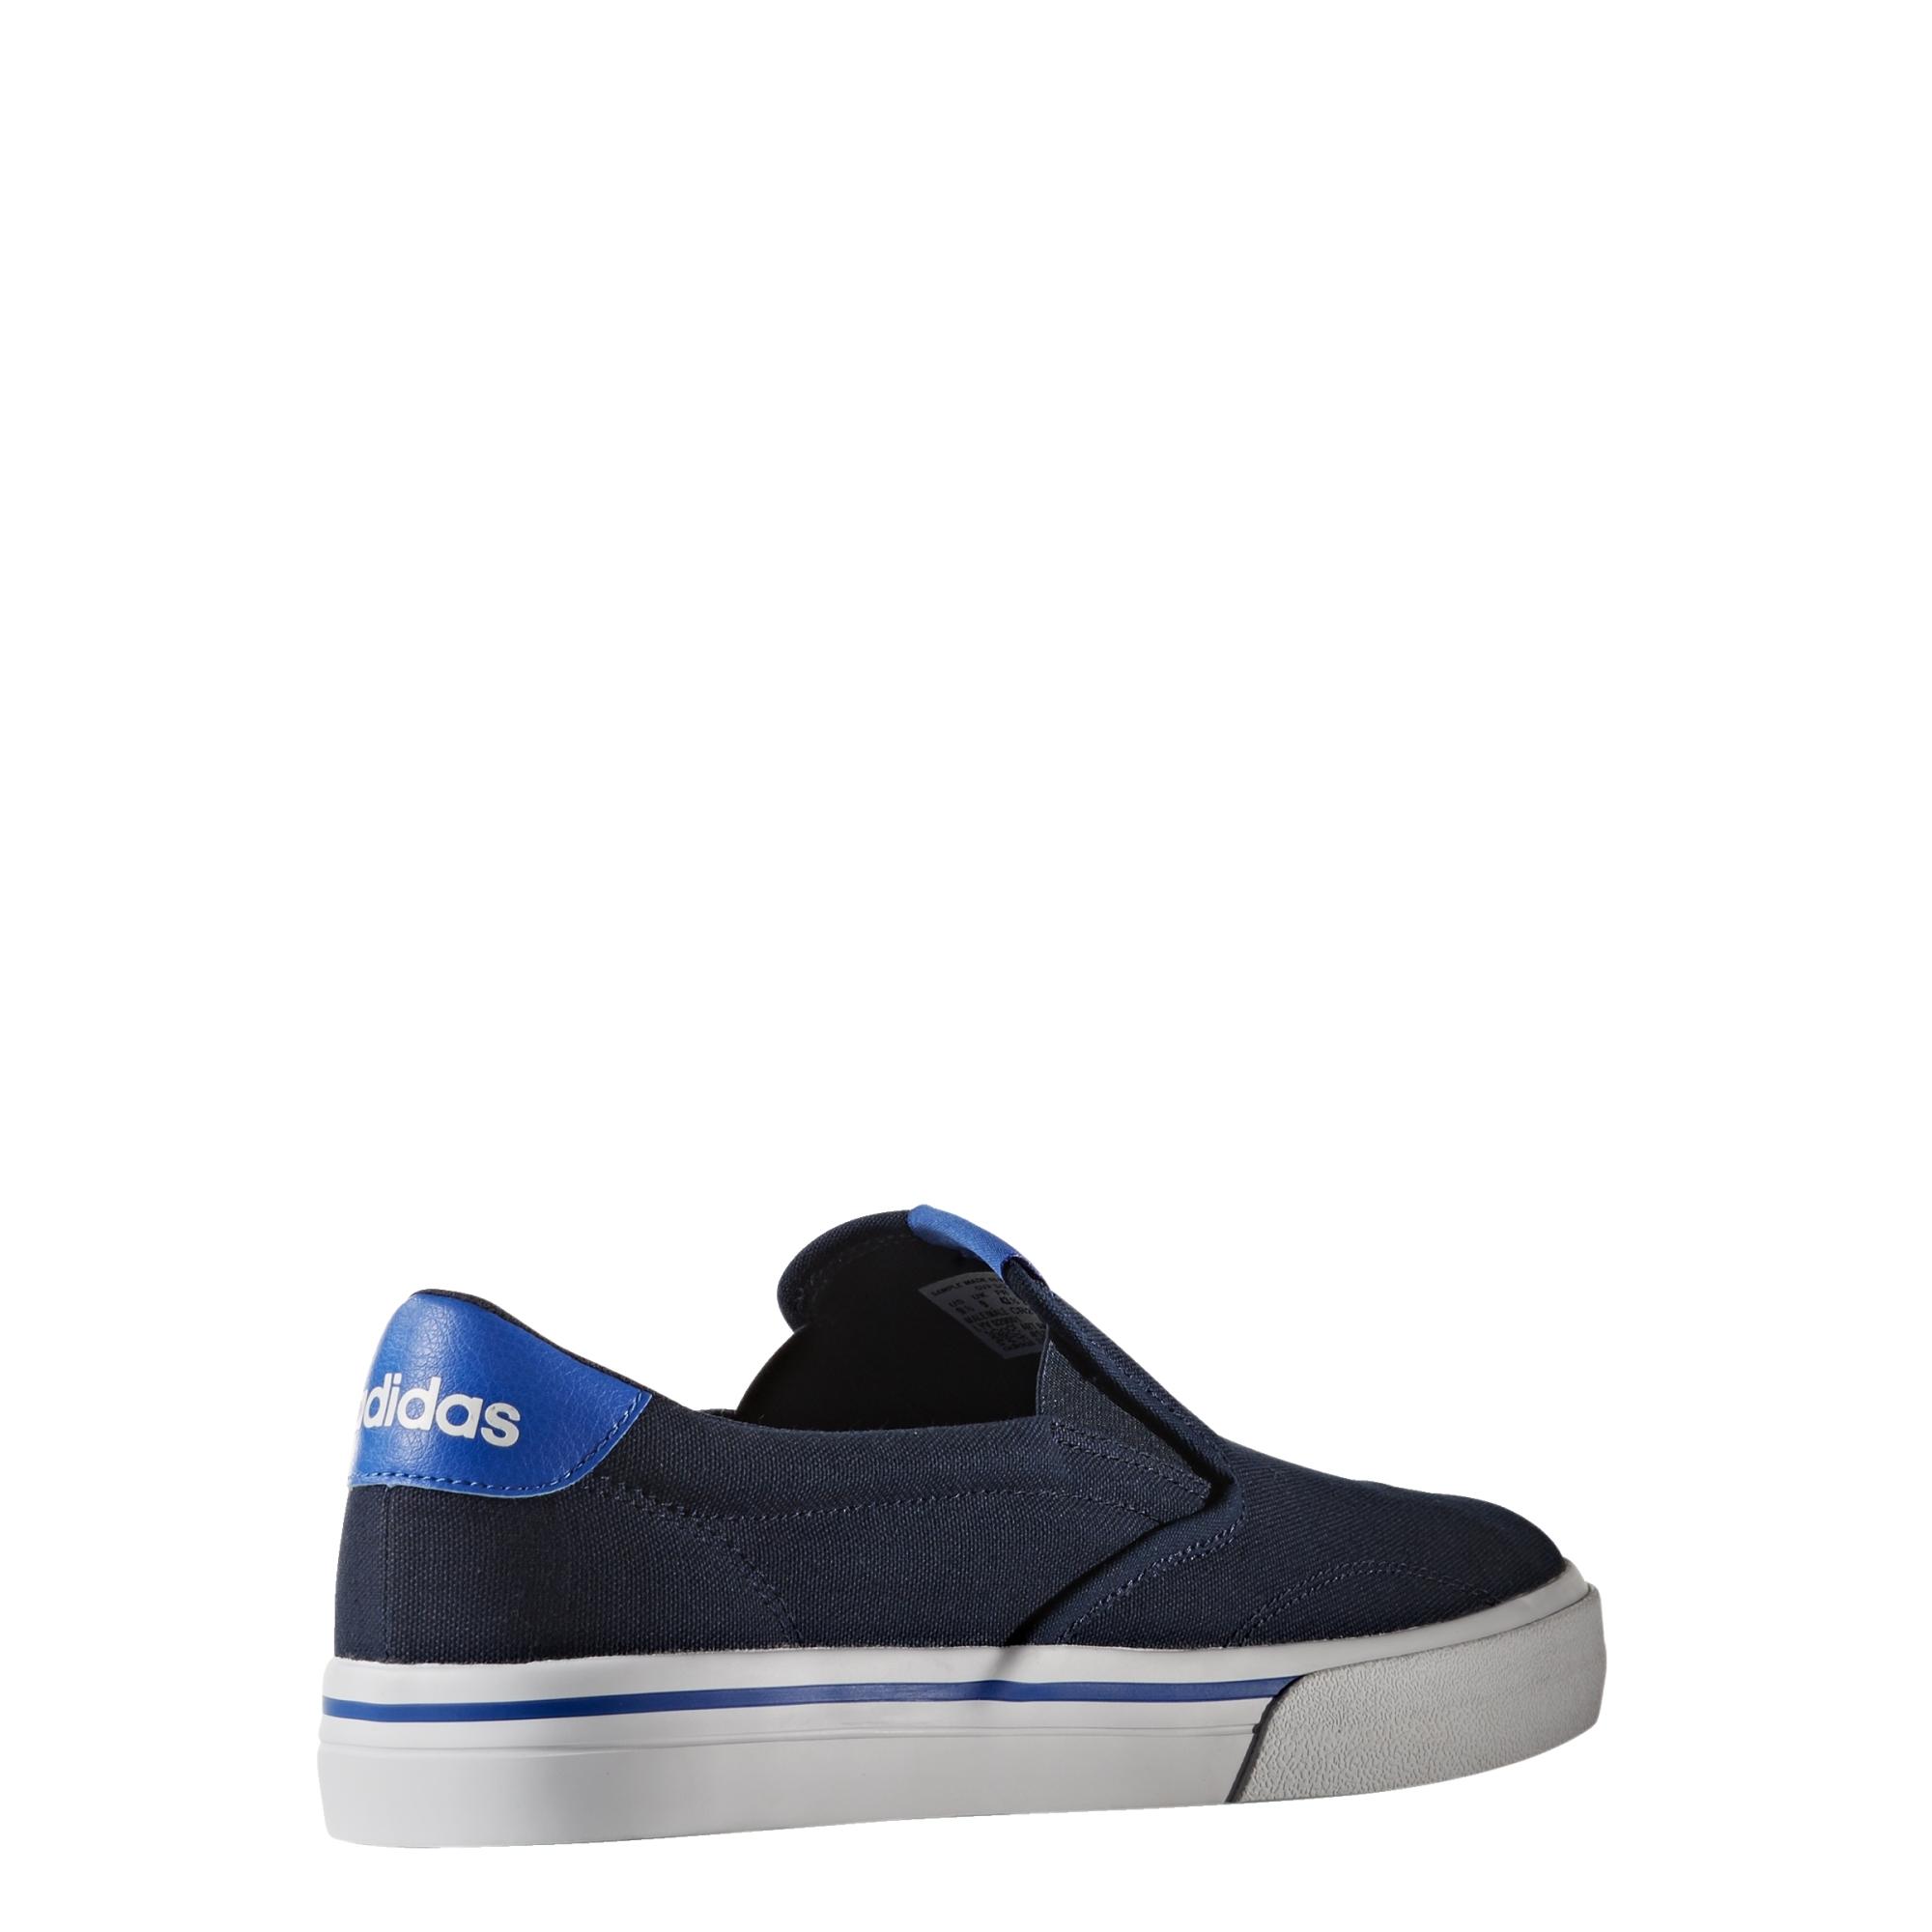 a985b2fc8 Pánska obuv | Adidas GVP OS - AW3900 | ŠPORT-NIKA